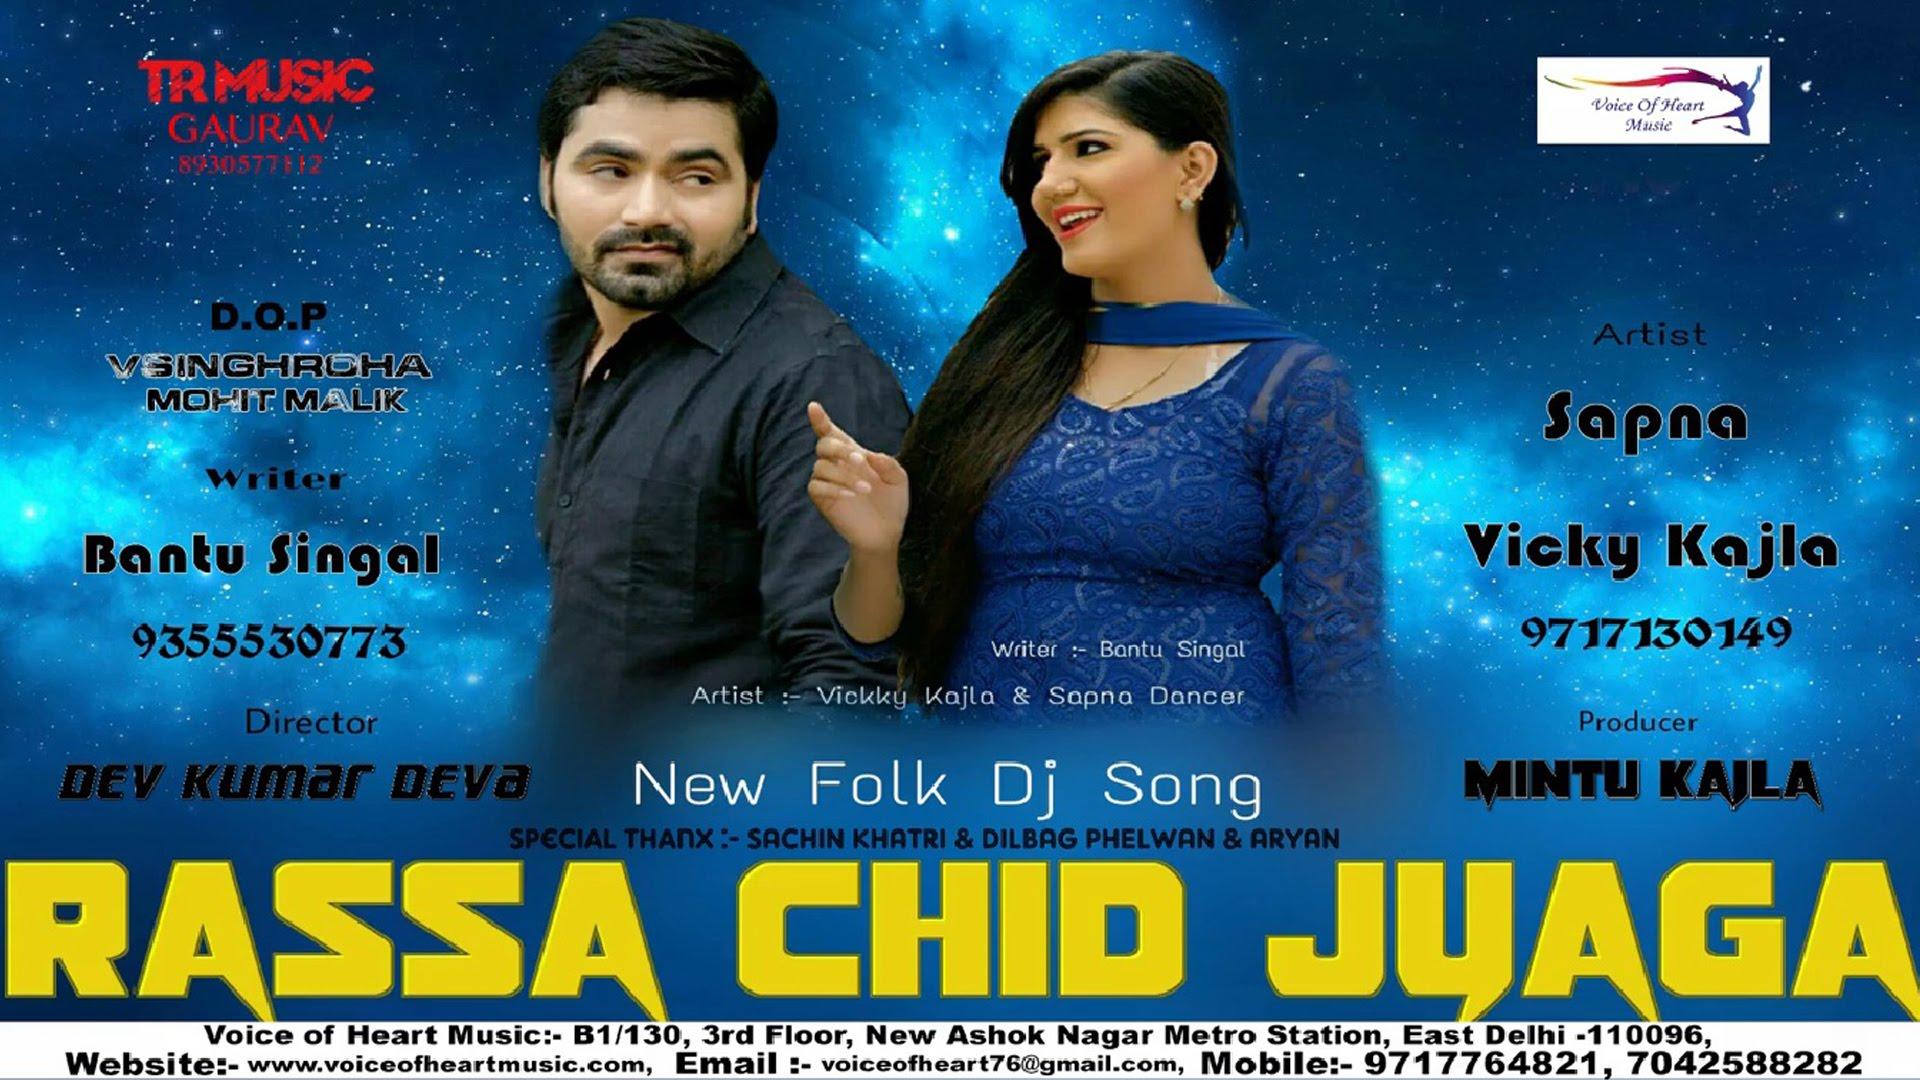 Rassa Chid Jyaga Song By Vickky Kajla & Sapna Chaudhary